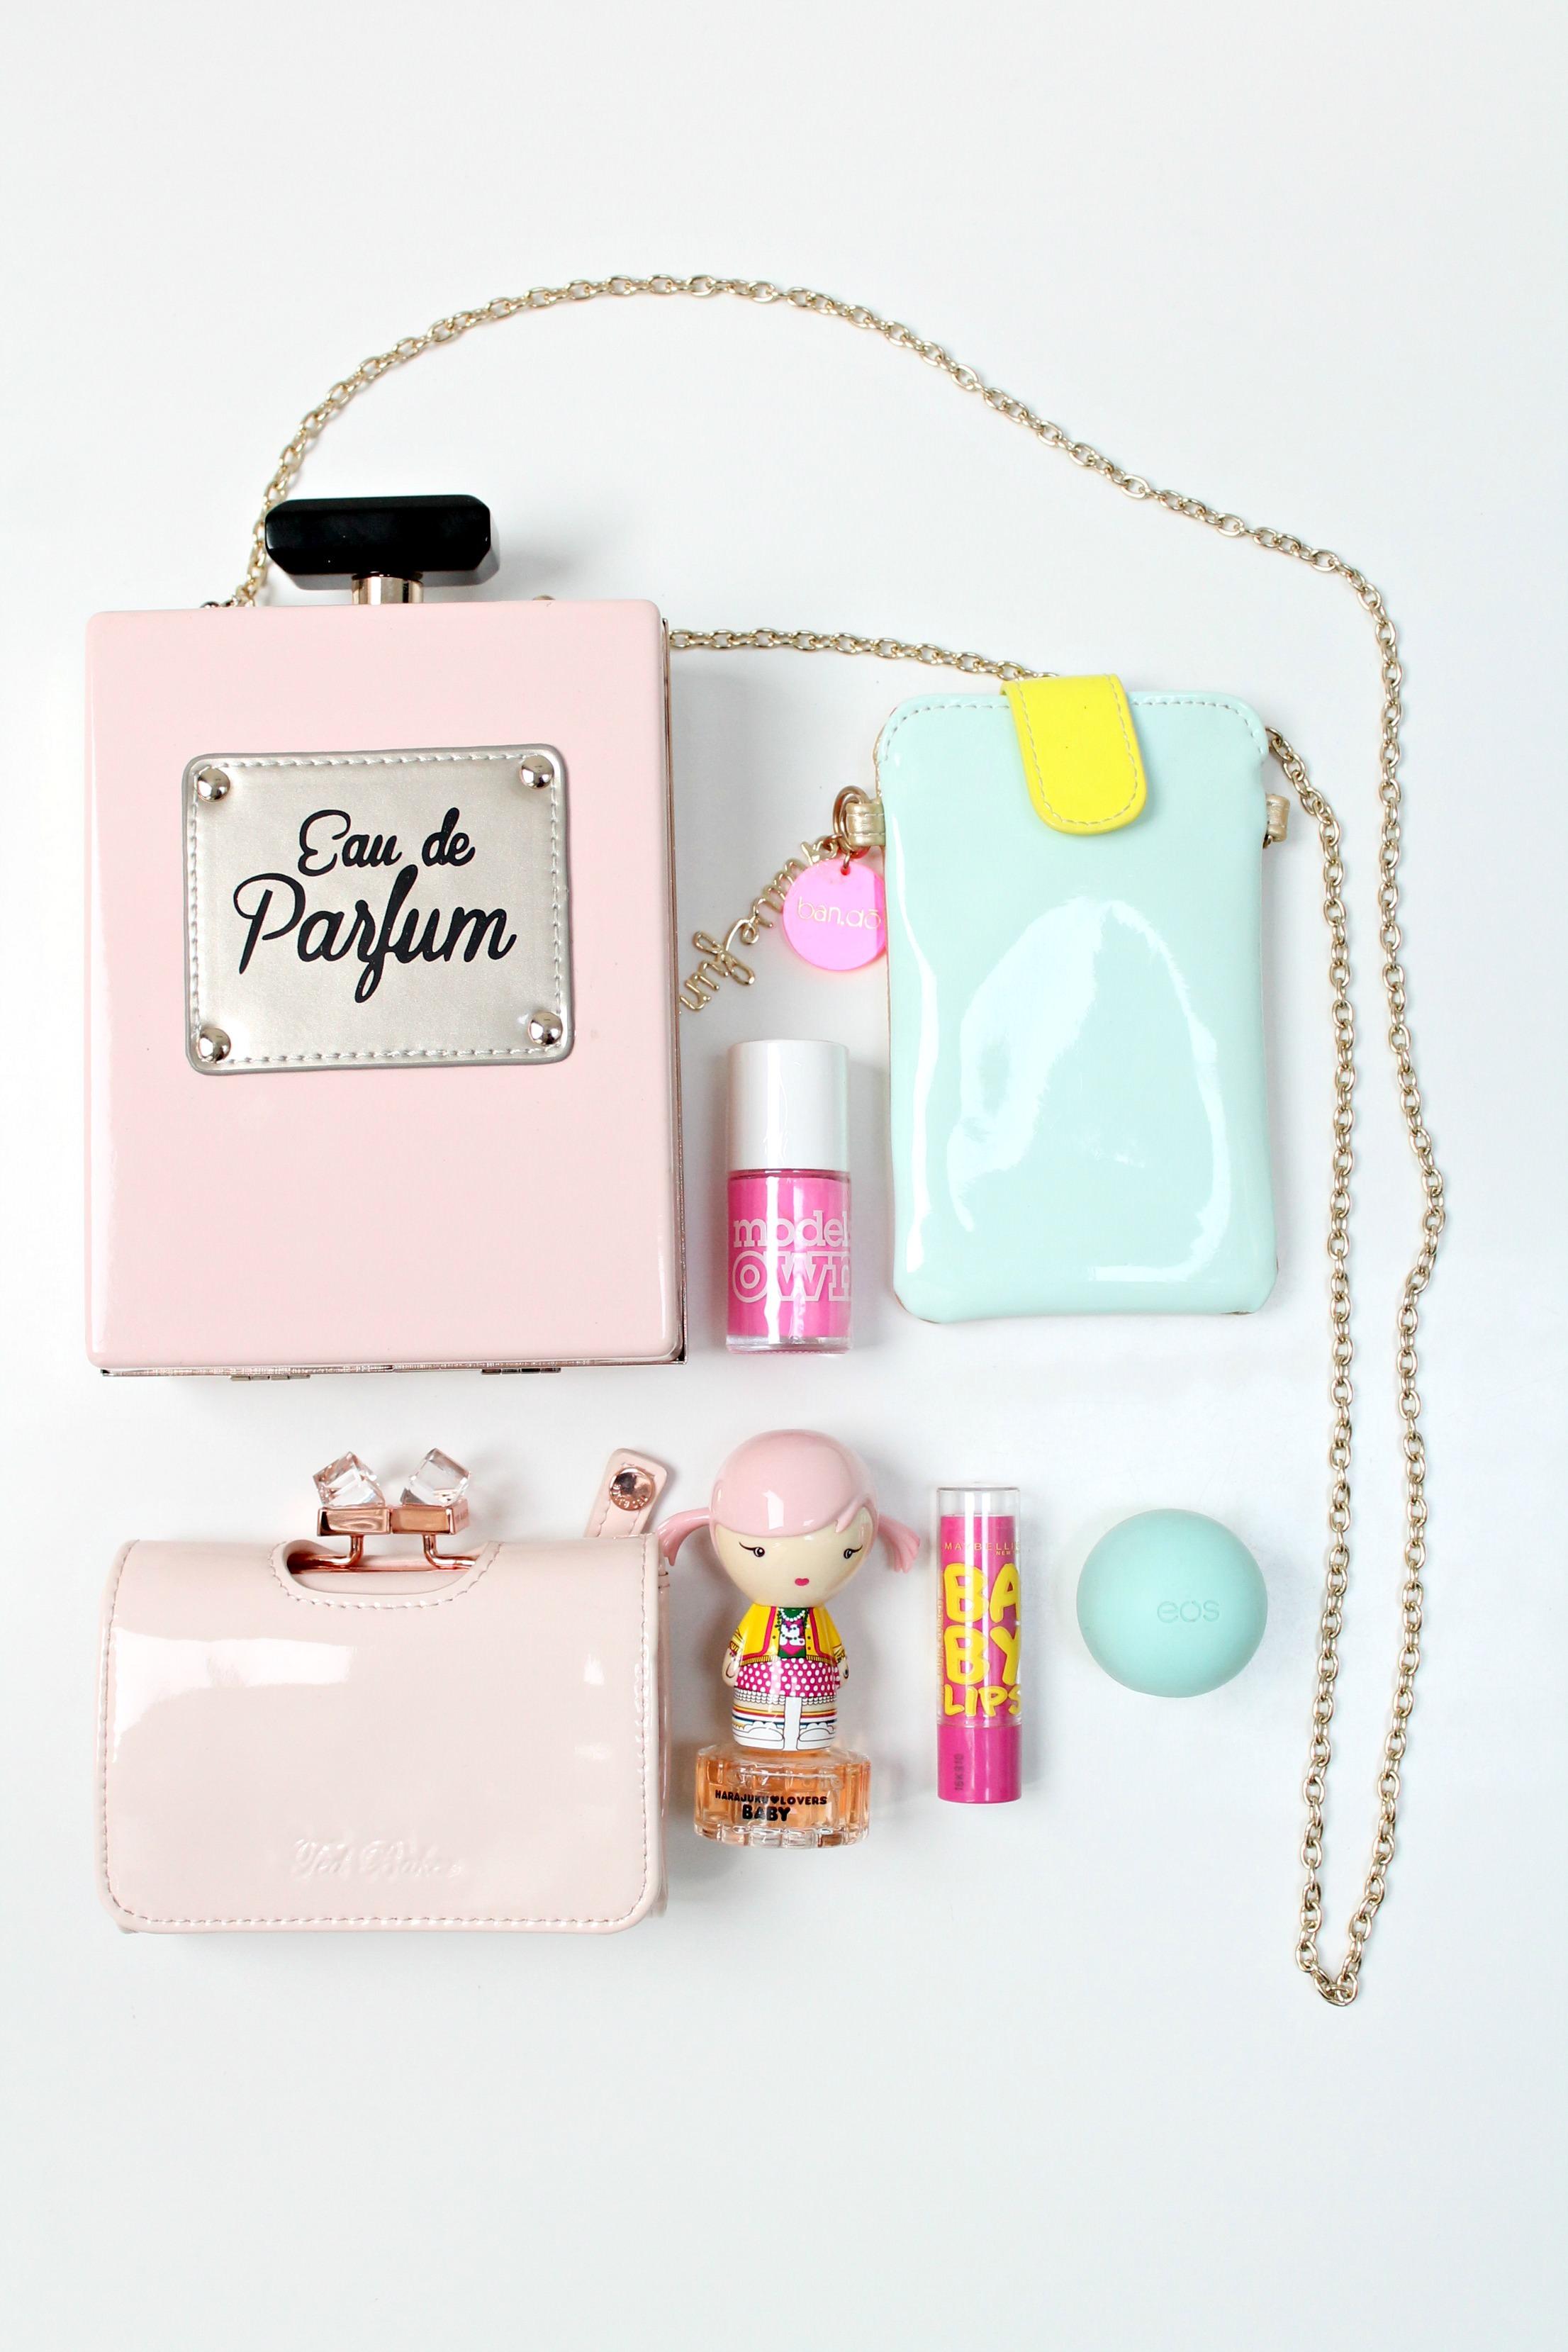 Next-Eau-de-parfum-handbag-and-Bando-Little-Big-Bell